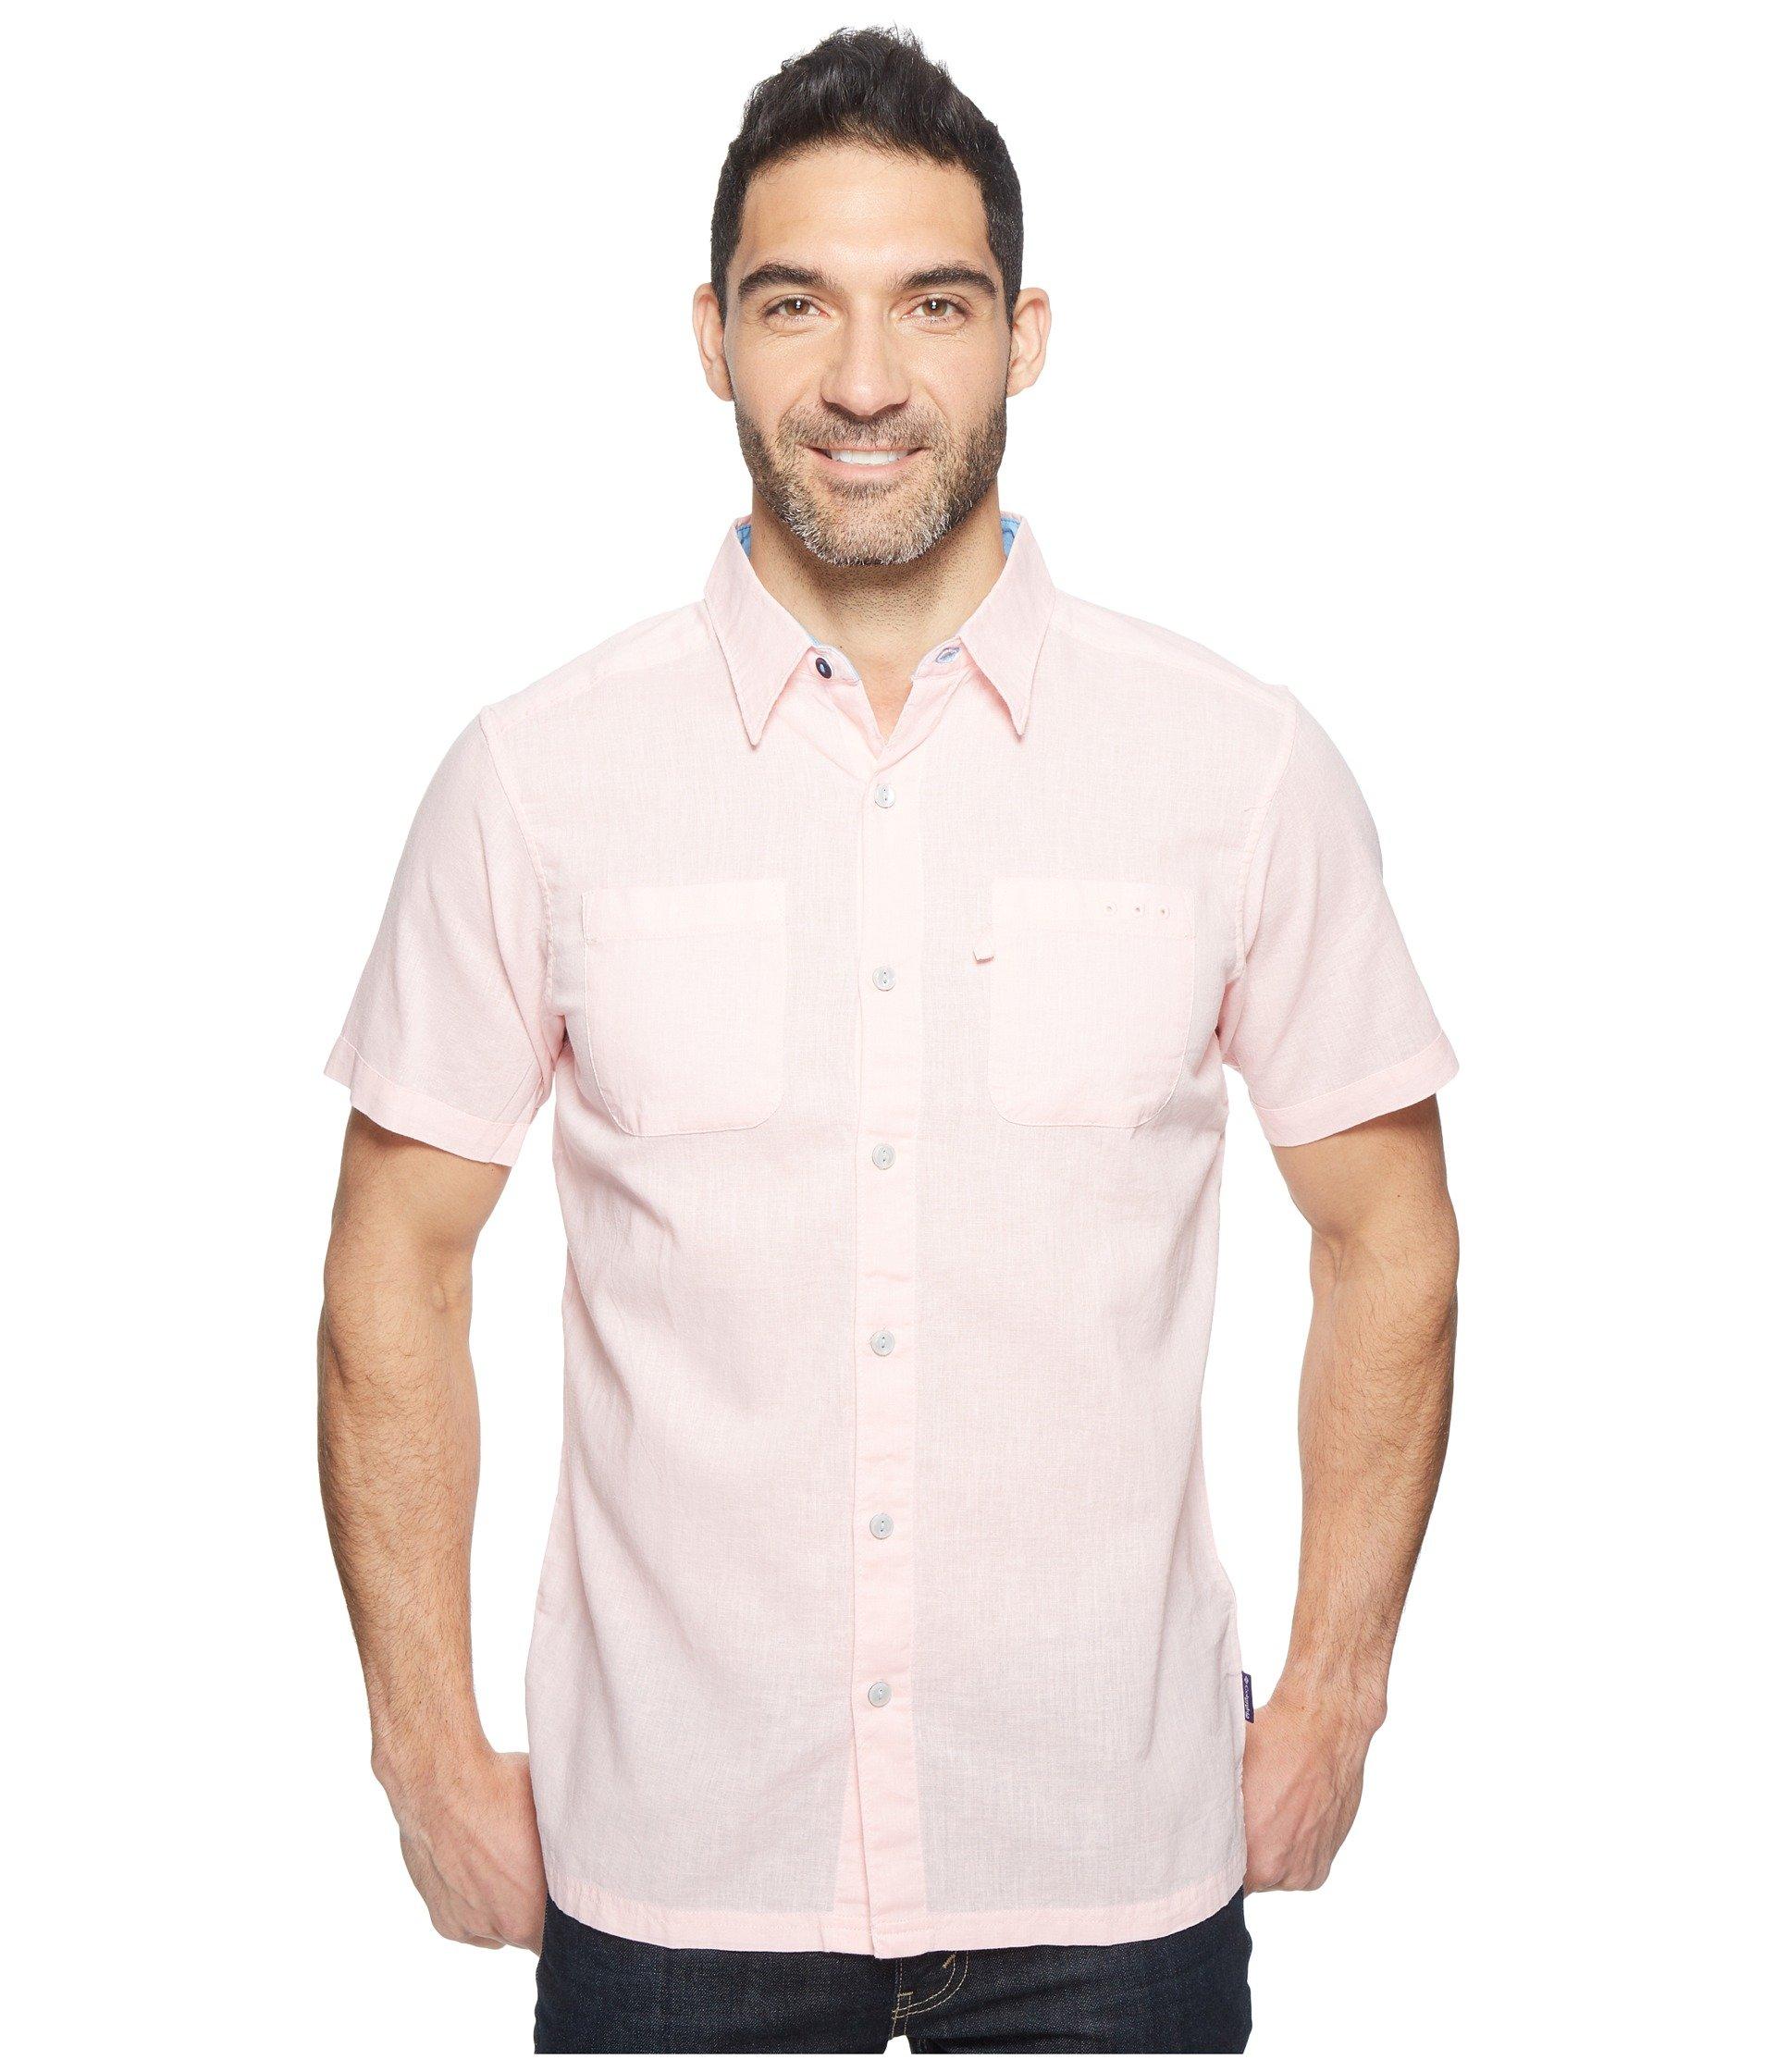 61aba08e001 COLUMBIA. Harborside Slim Fit Linen Camp Shirt in Stone Collegiate Navy